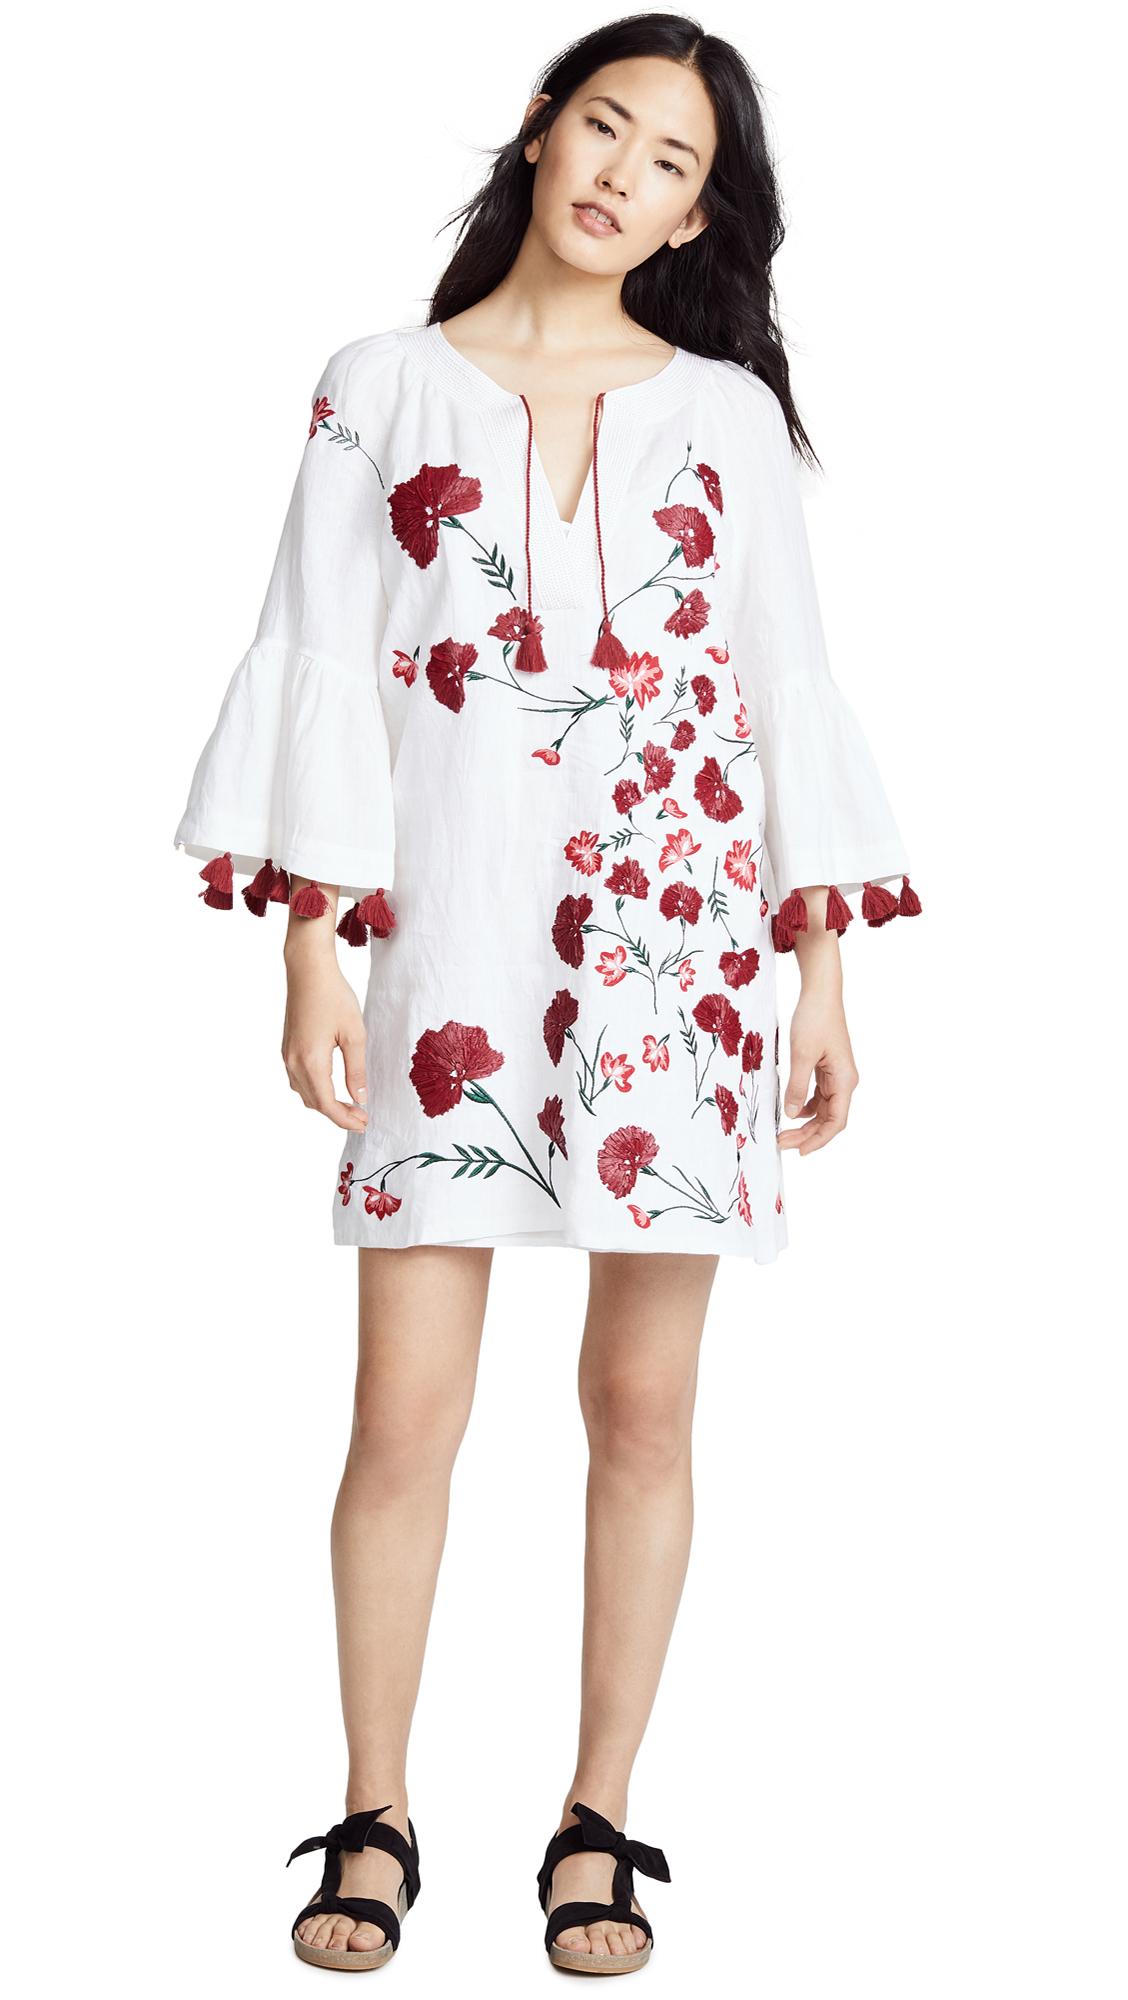 Club Monaco Dulira Dress - White/Red